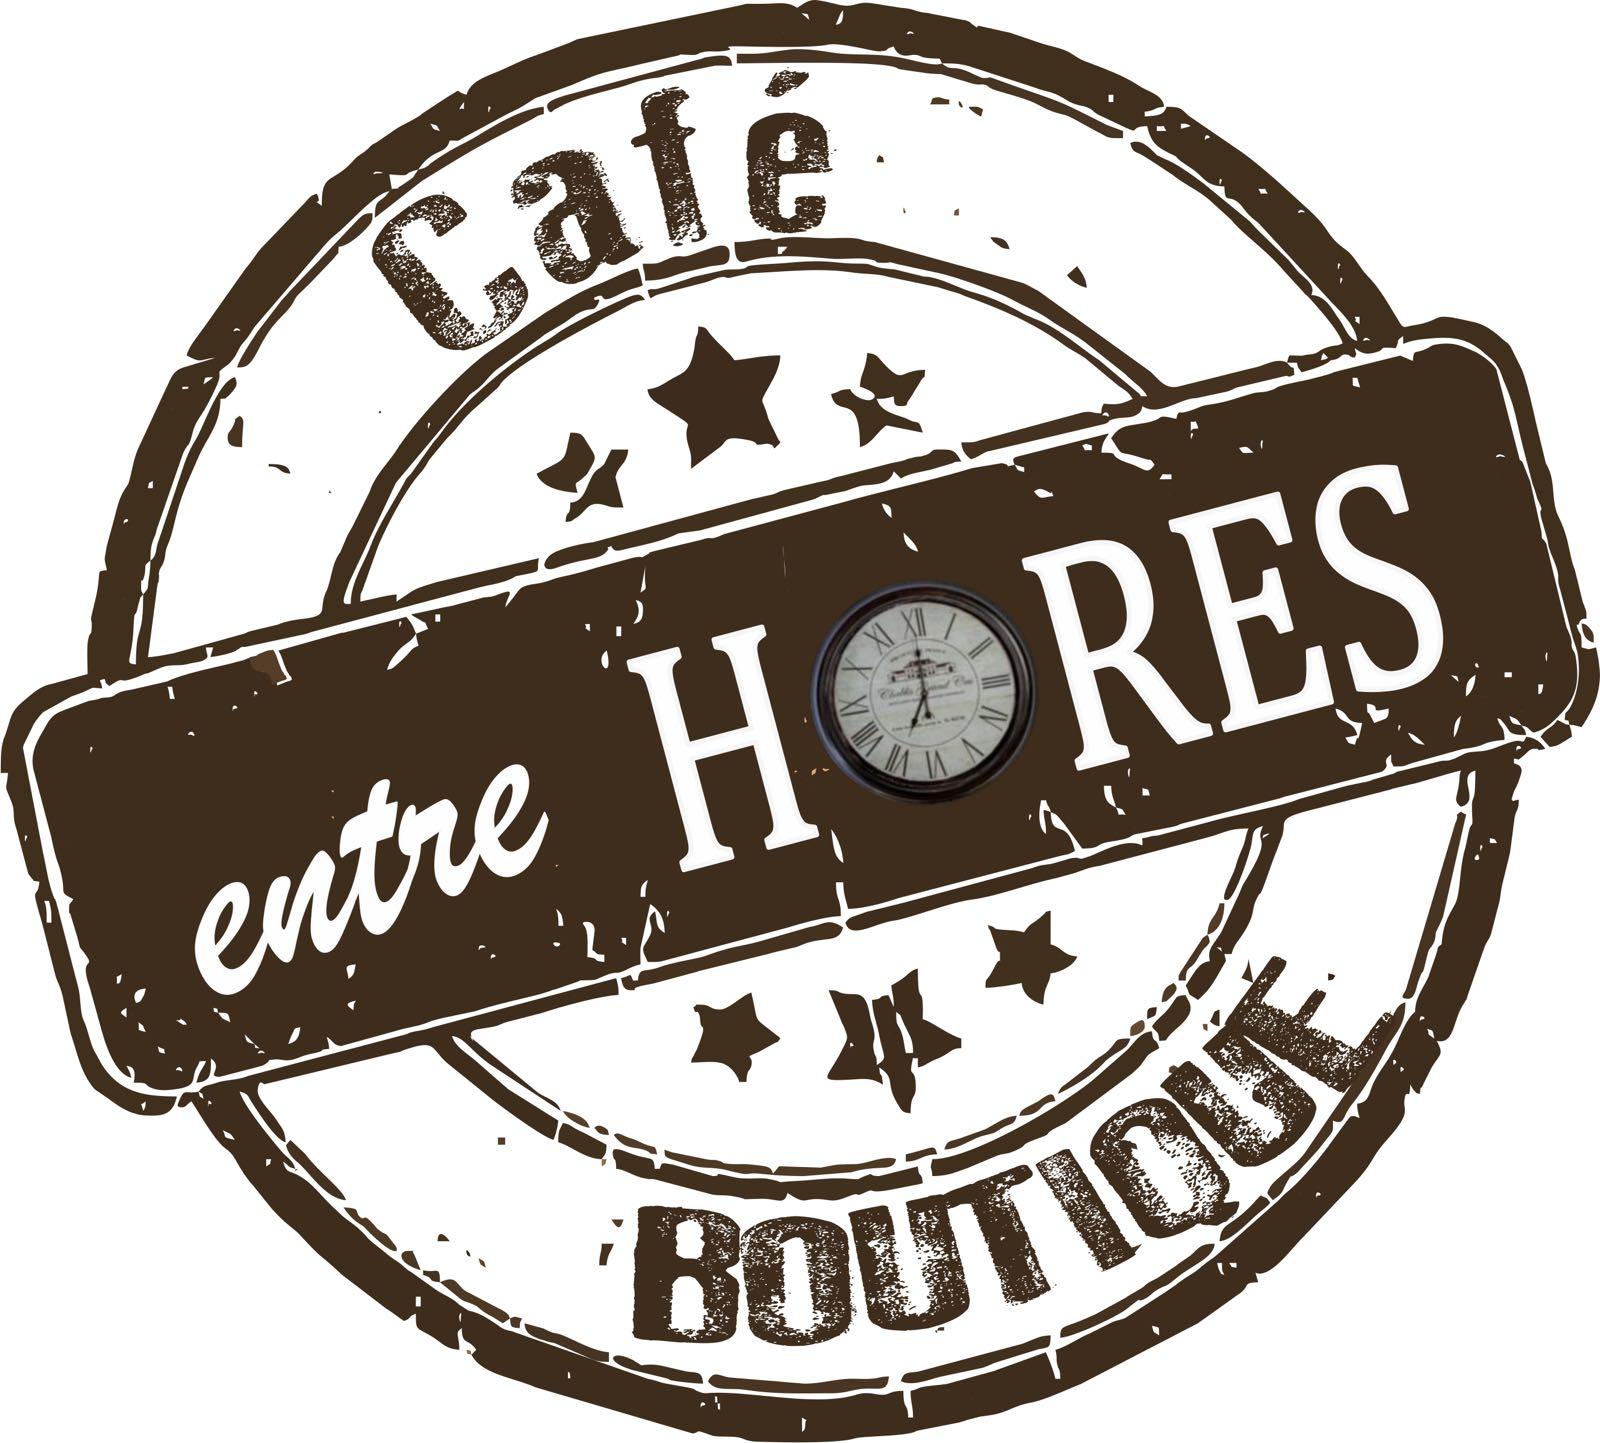 ENTRE HORES